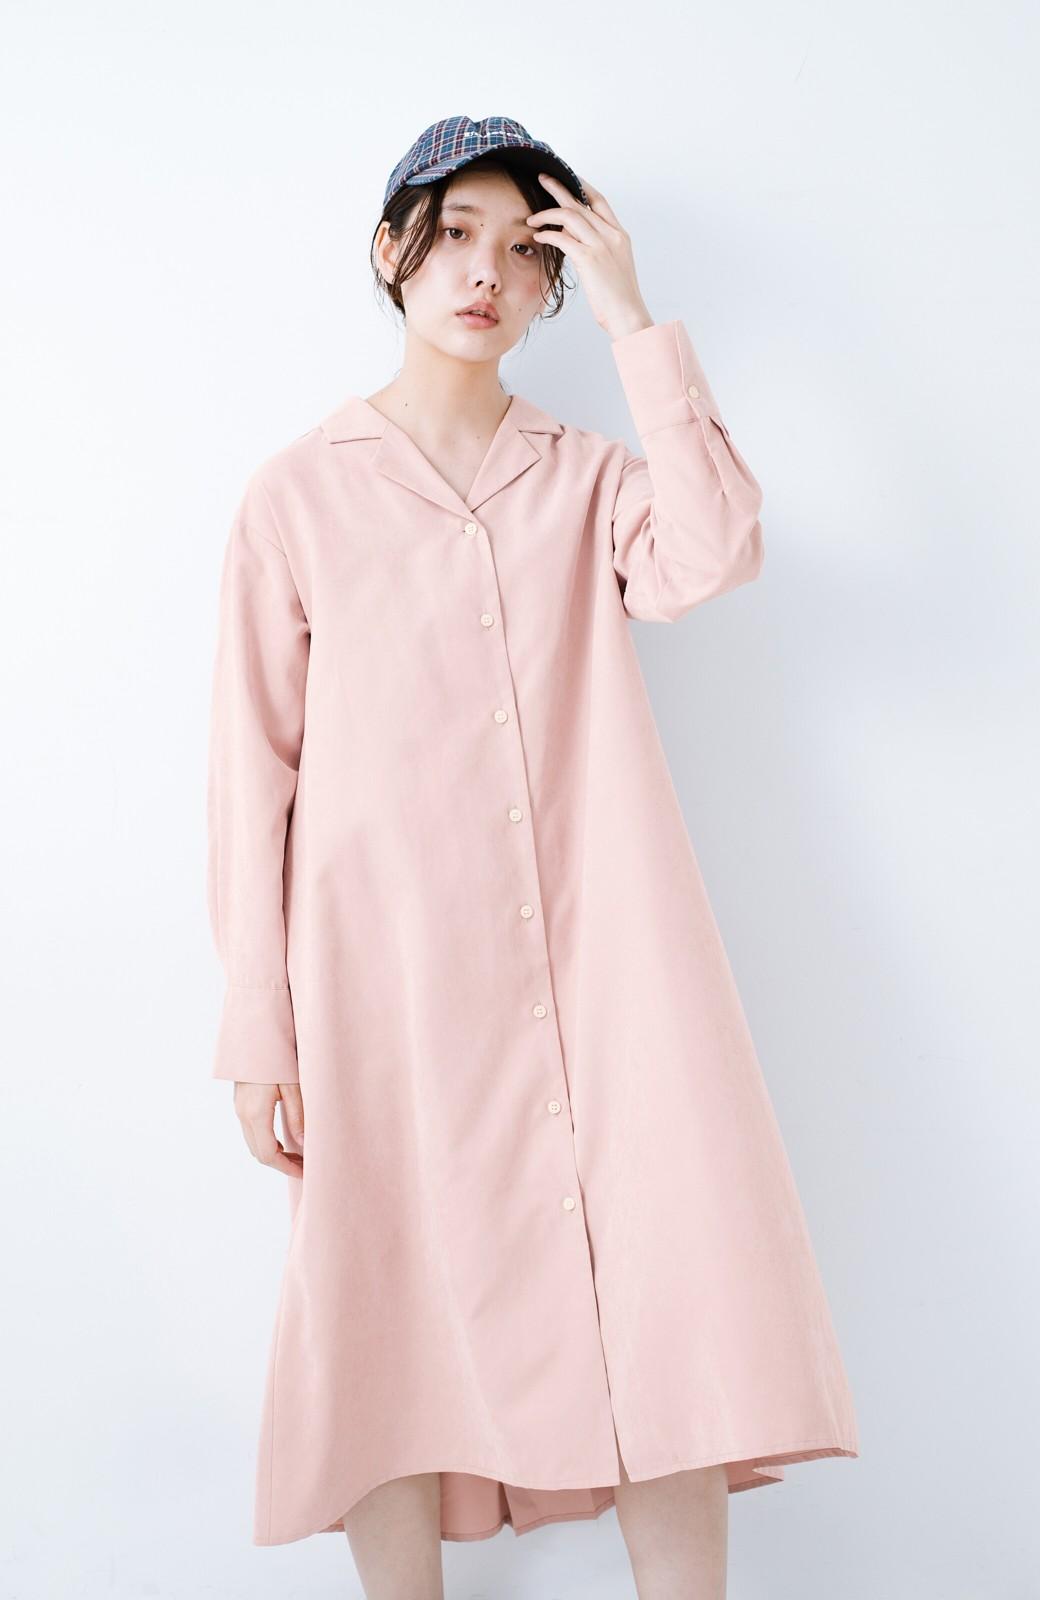 haco! 太ってもばれずに羽織っても便利なAラインワンピース <ピンク>の商品写真10